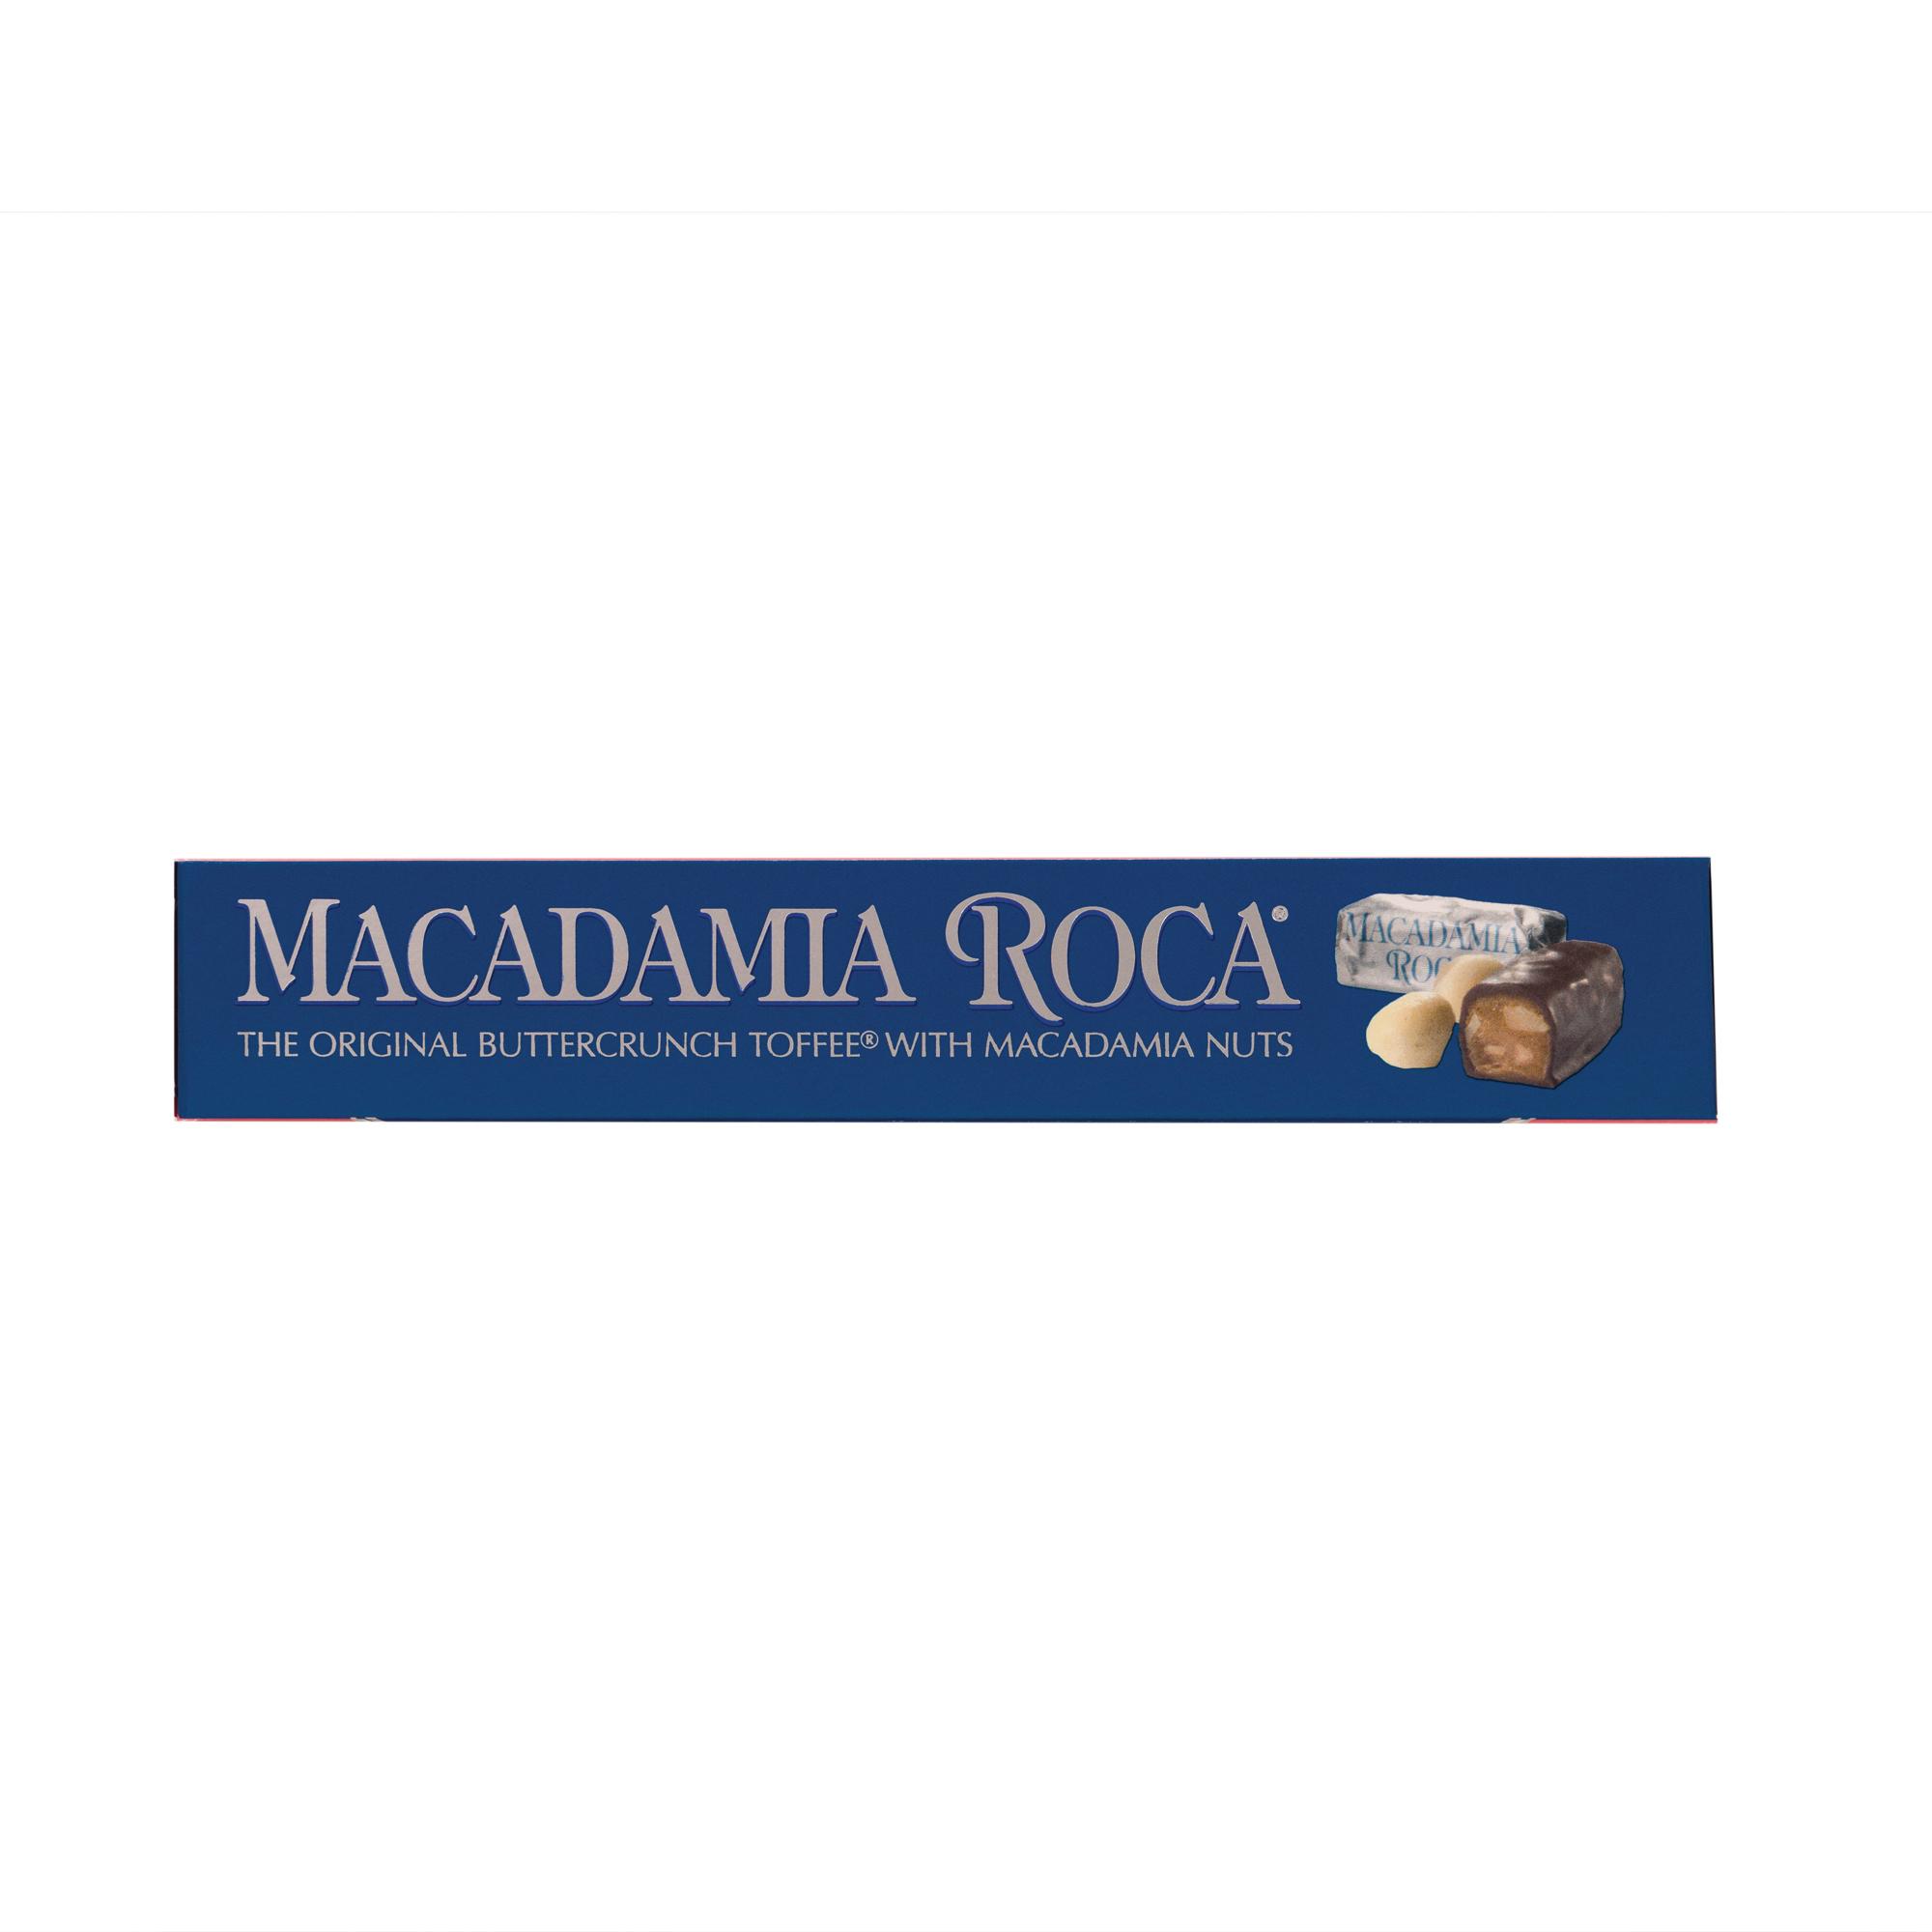 0602 4.9 oz MACADAMIA ROCA® Gift Box - Top View